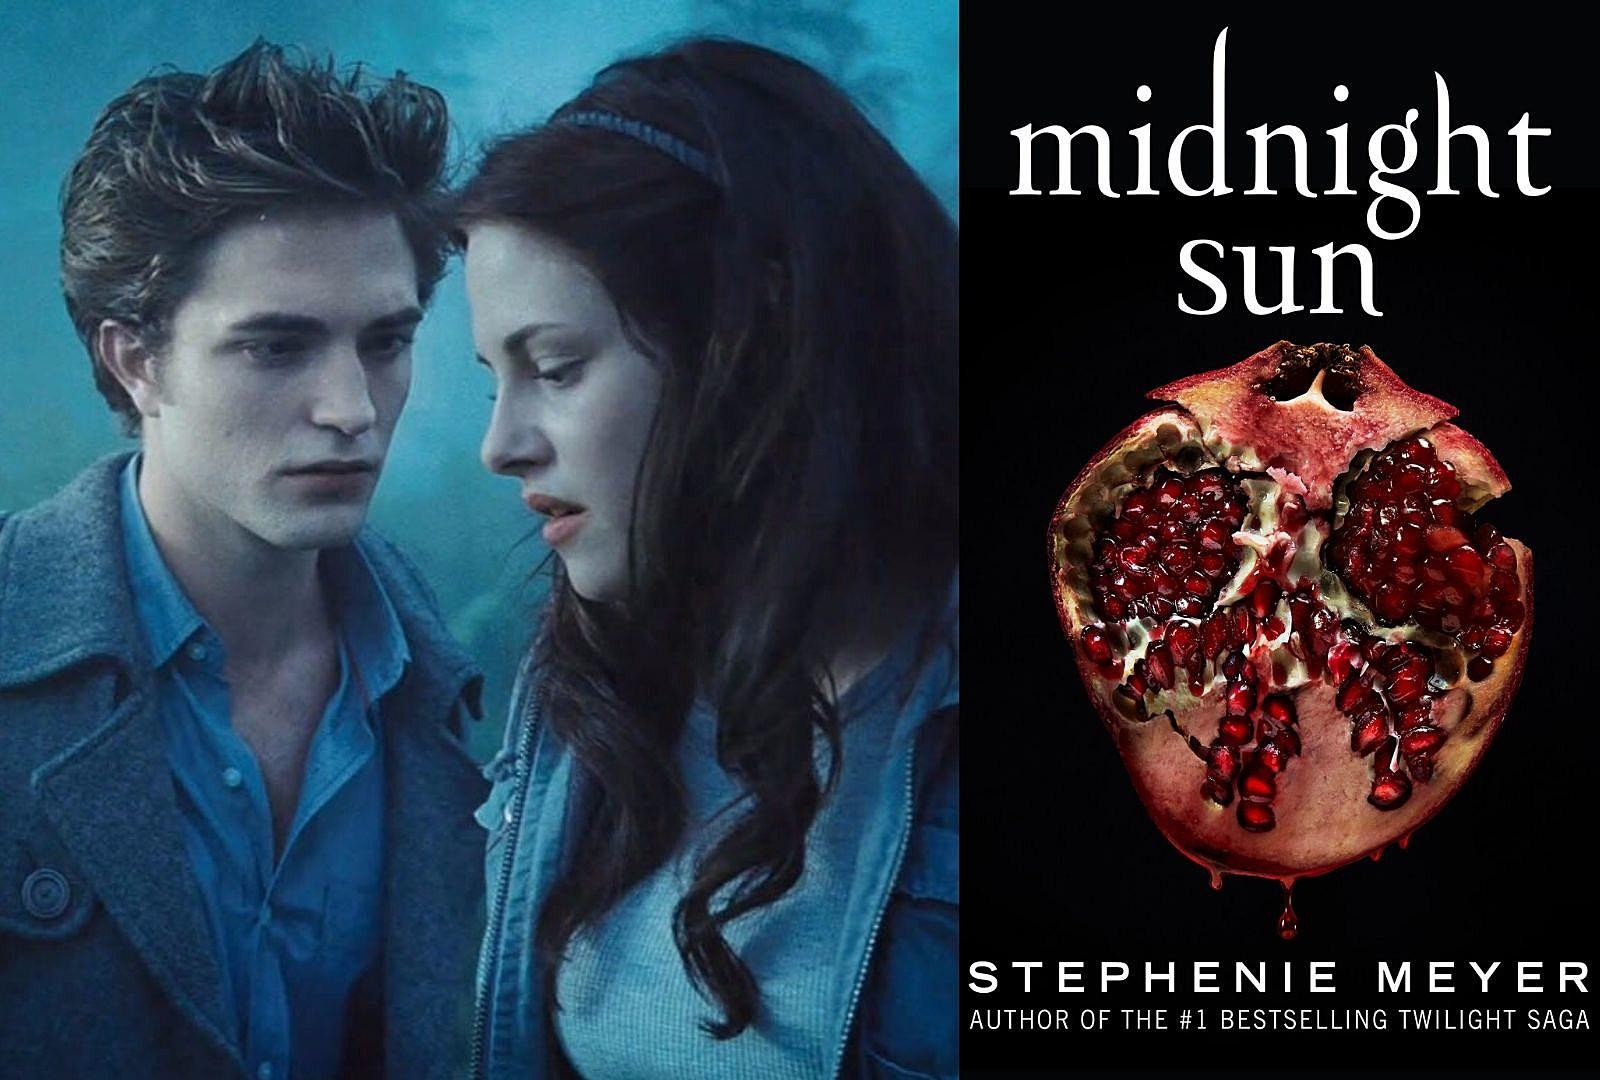 Twilight book set